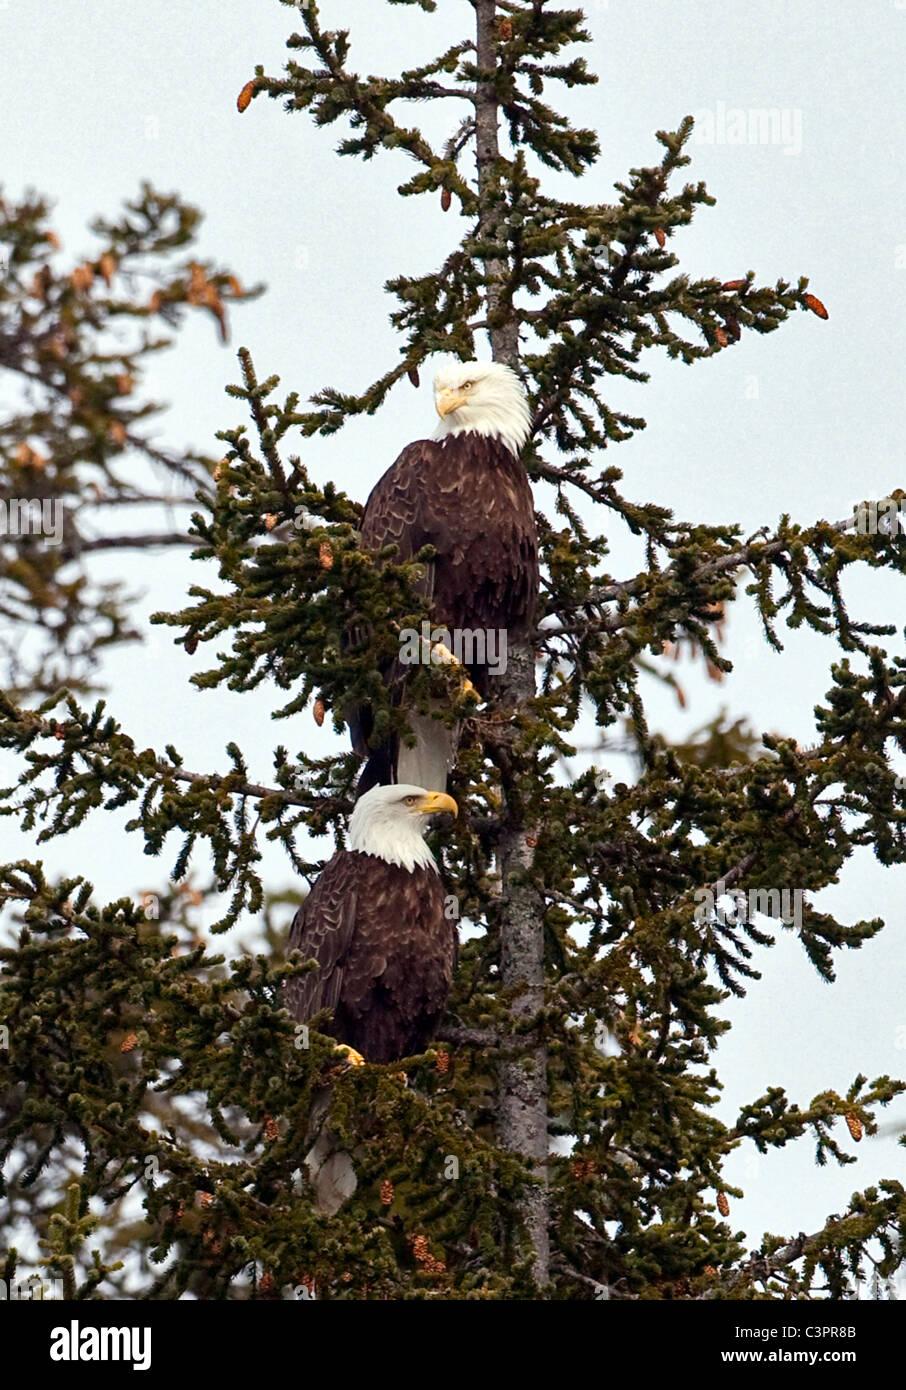 A pair of nesting bald eagles (Haliaeetus leucocephalus) perch in a tree in Alaska. - Stock Image